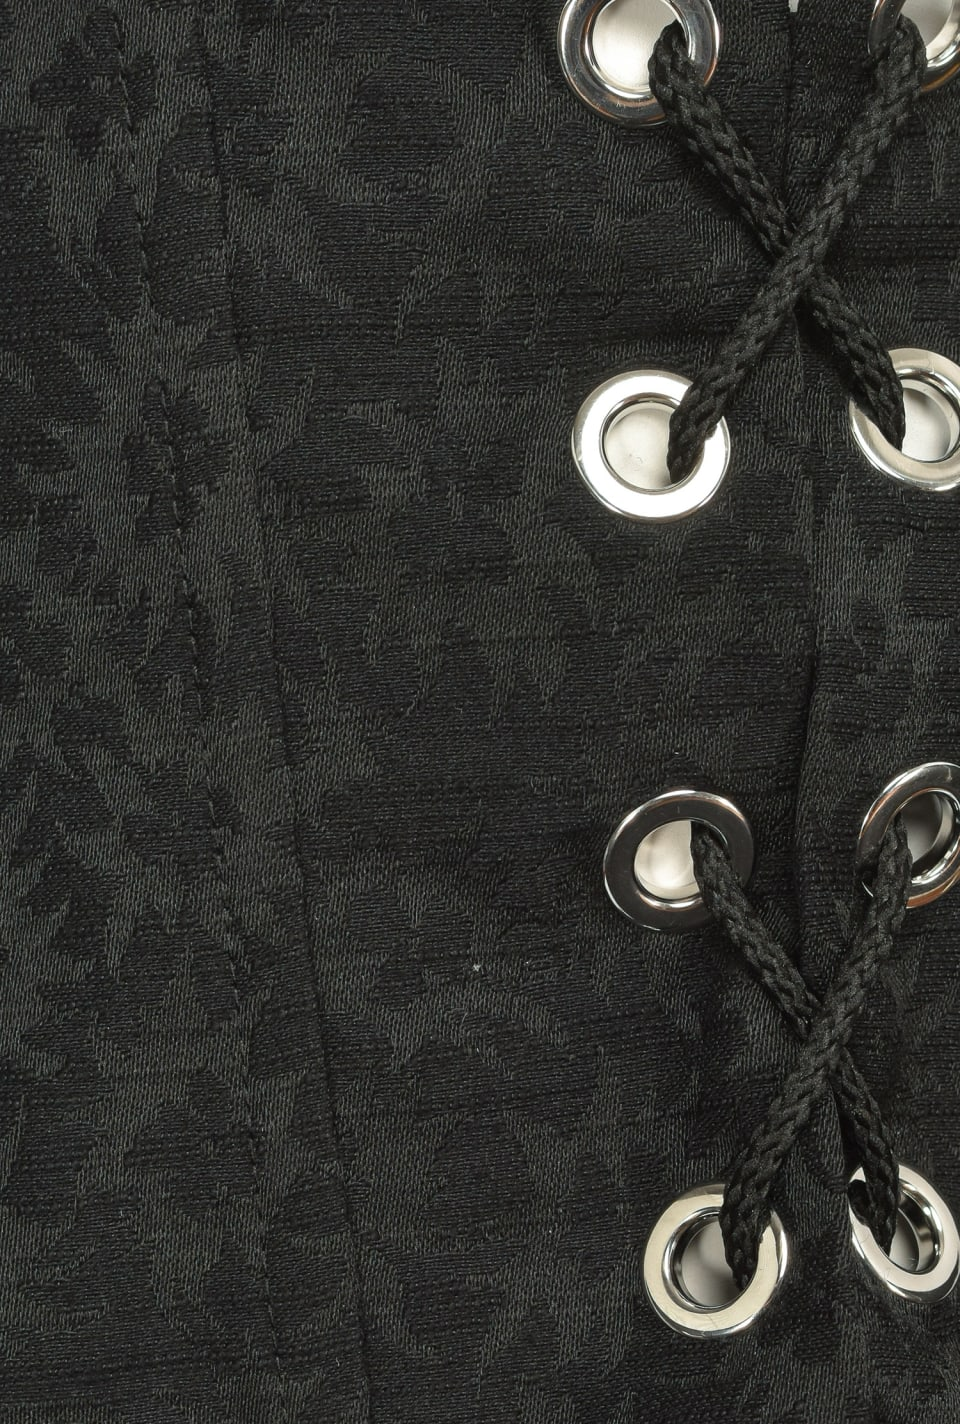 Jacquard corset belt - Pinko